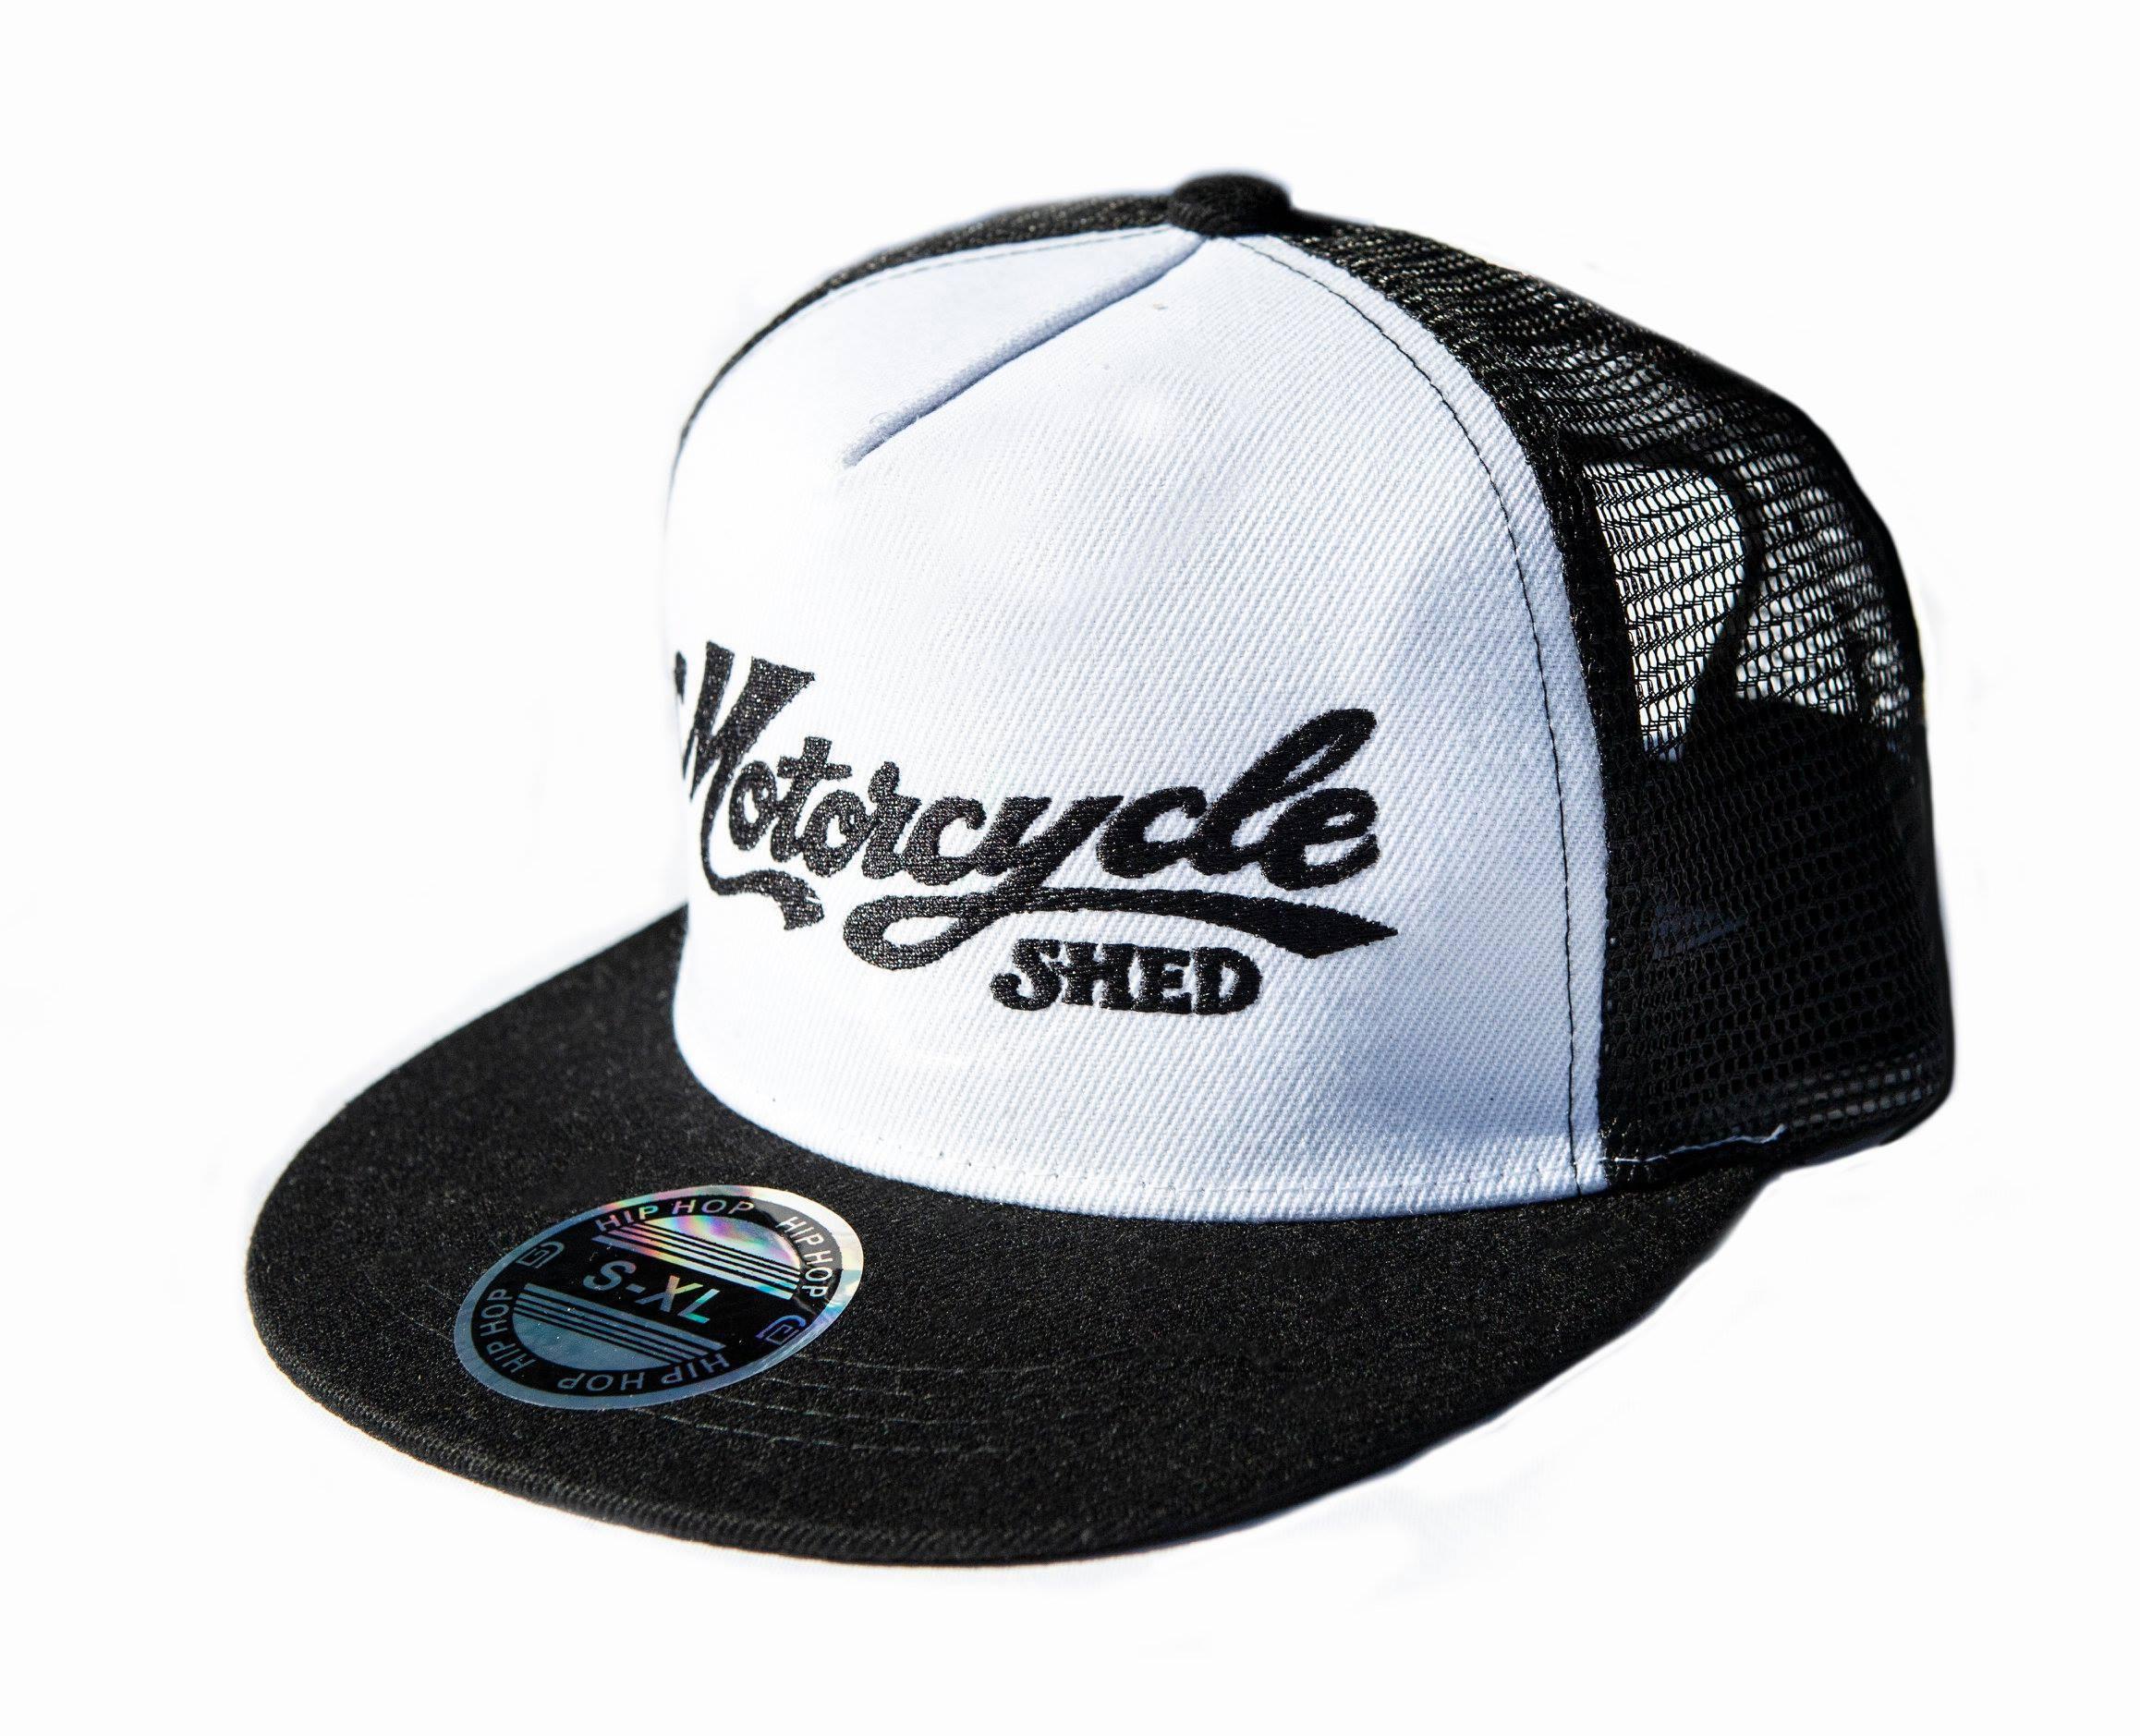 Motorcycle Shed Flat Cap - Mesh Back 00002